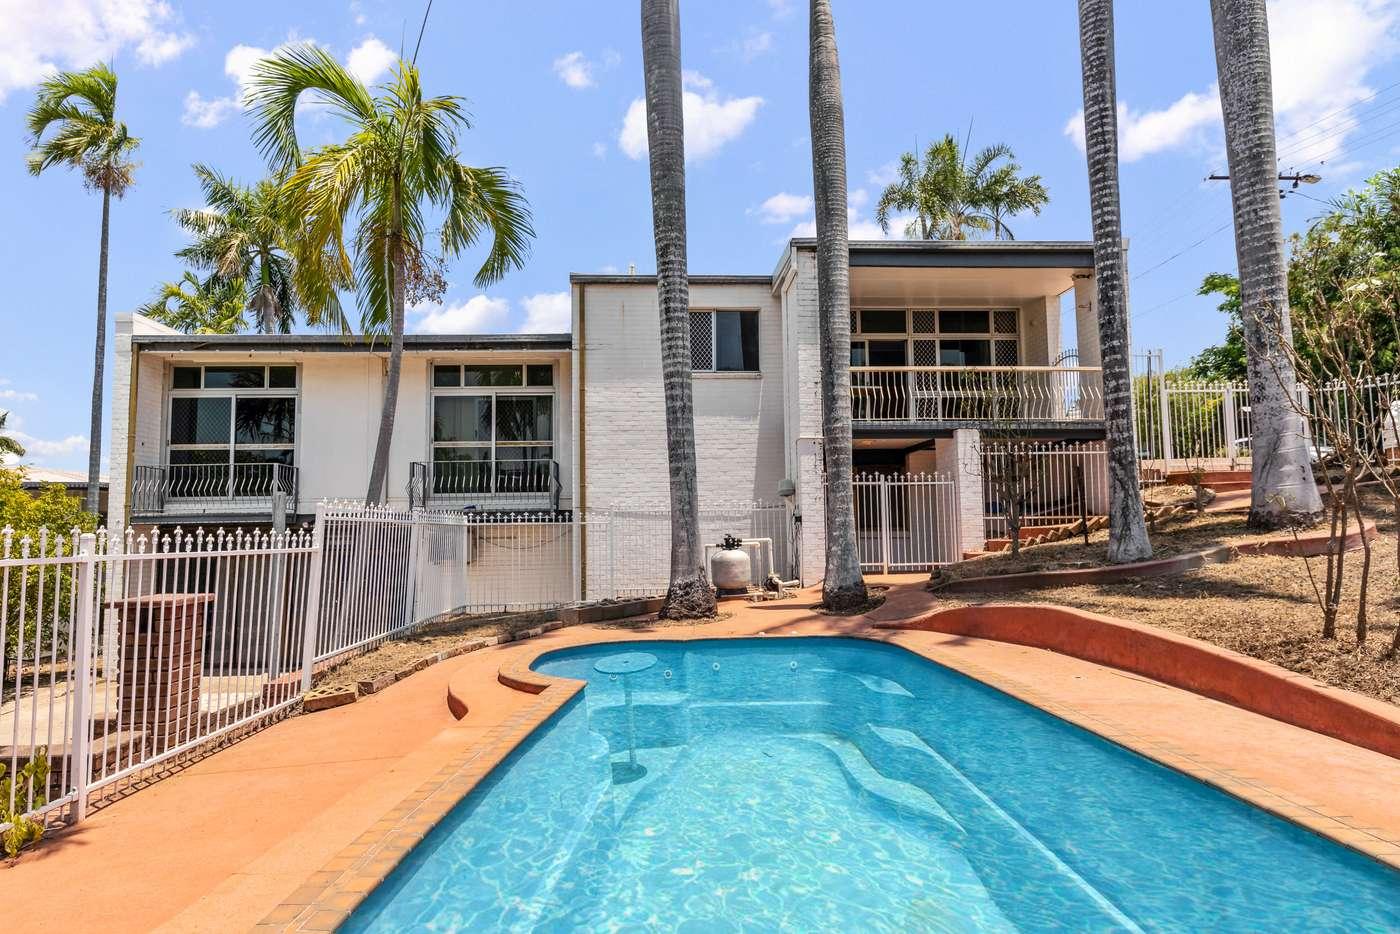 Main view of Homely house listing, 1 Godfrey Court, Larrakeyah NT 820